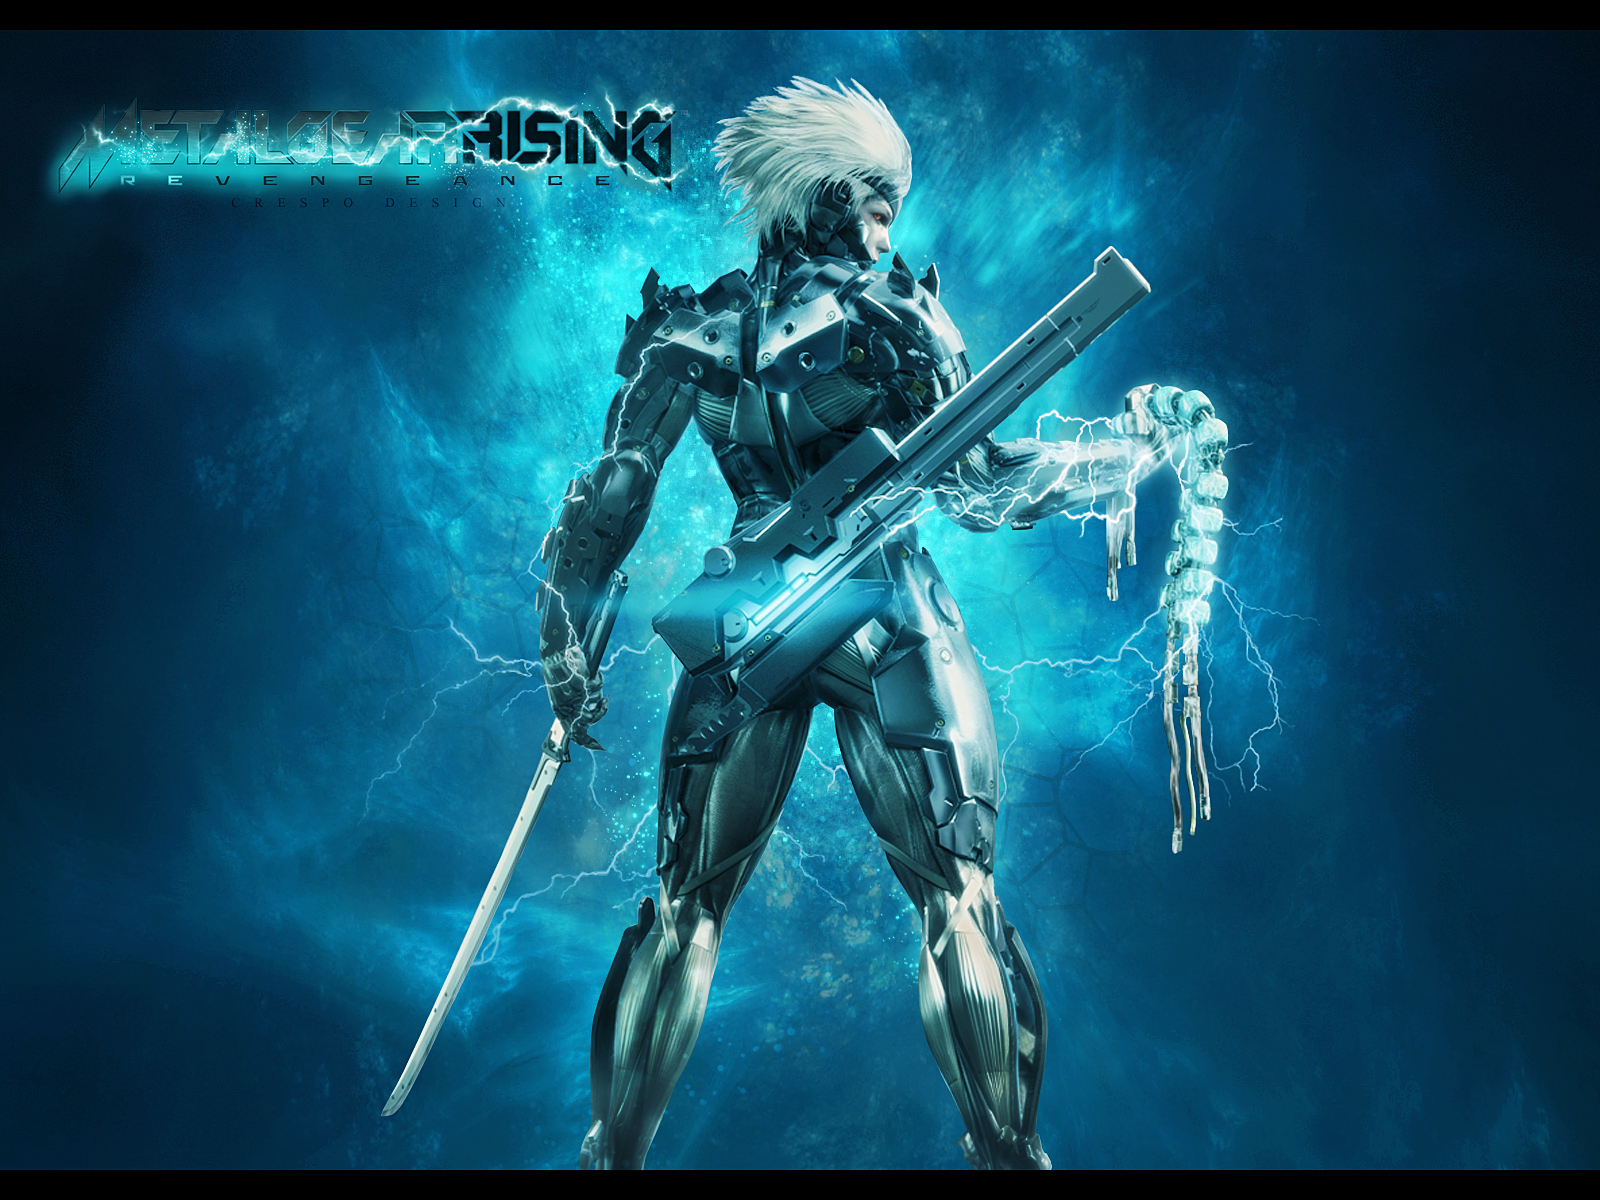 metal gear rising revengeance wallpaper by cre5po on